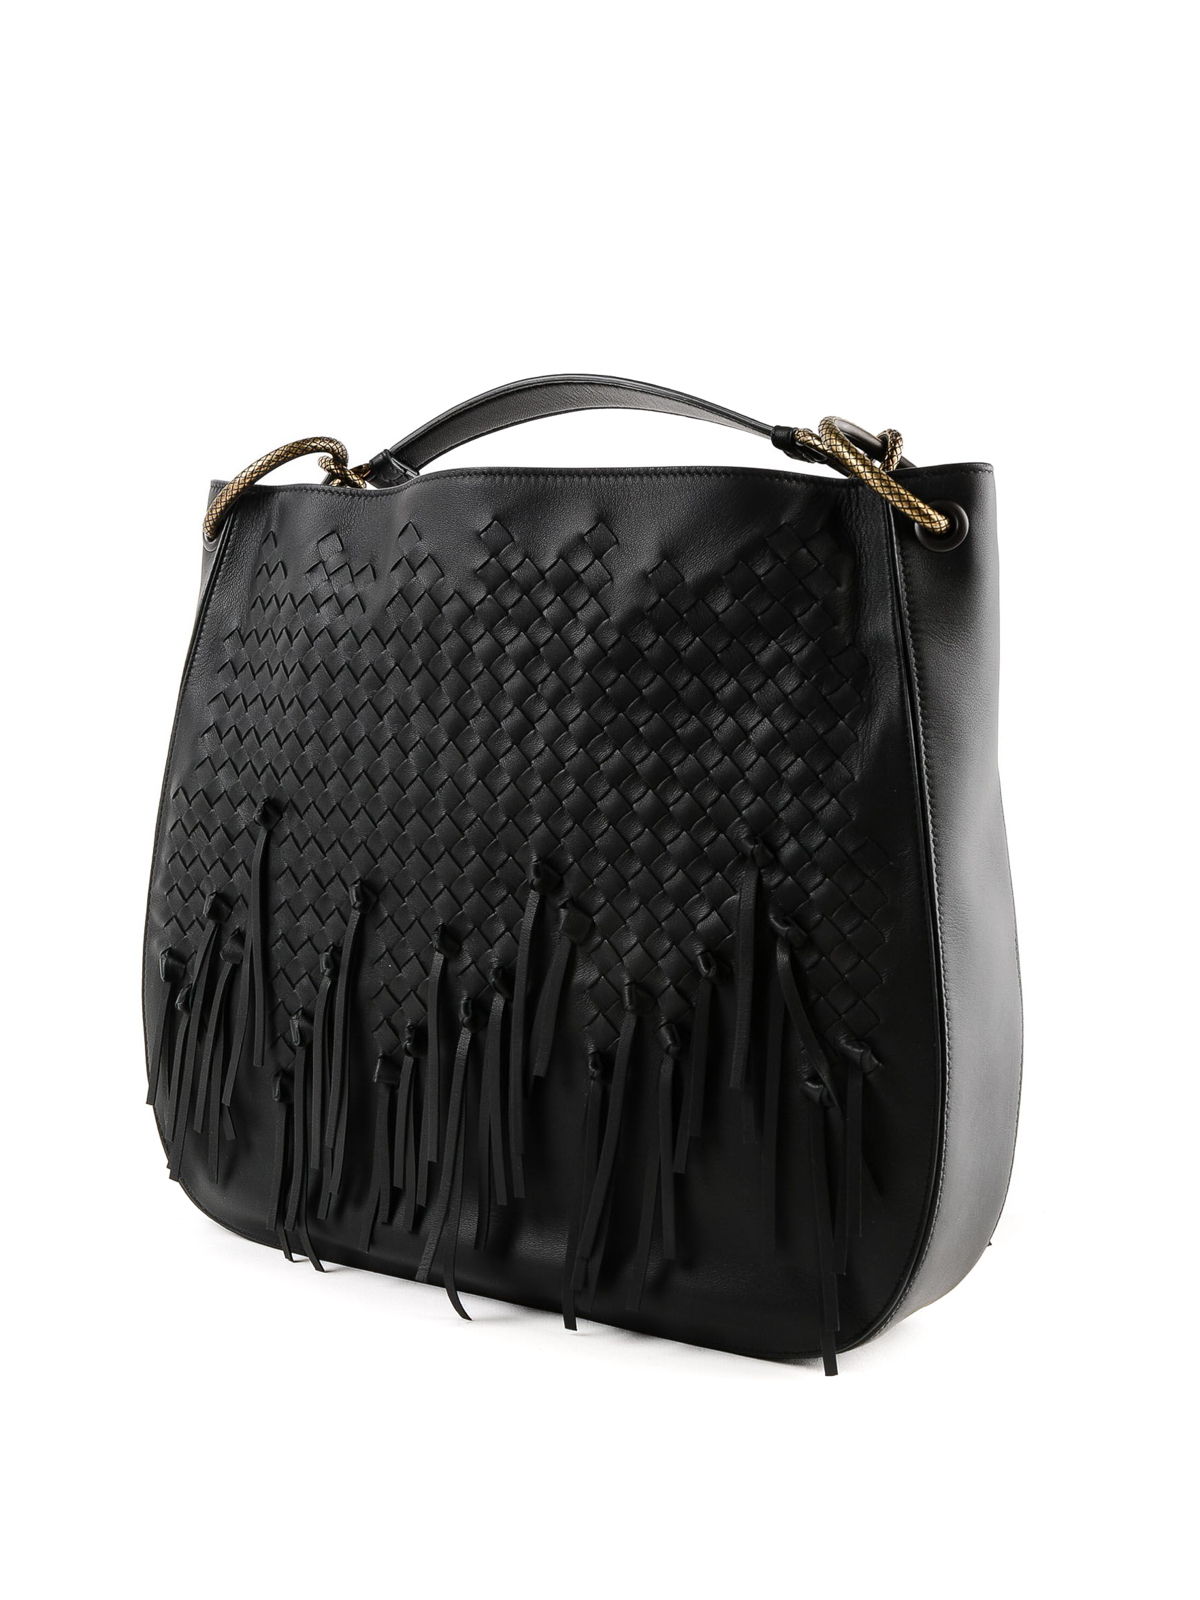 1e4efb5c42de iKRIX BOTTEGA VENETA  shoulder bags - Loop Intrecciato nappa leather hobo  large bag